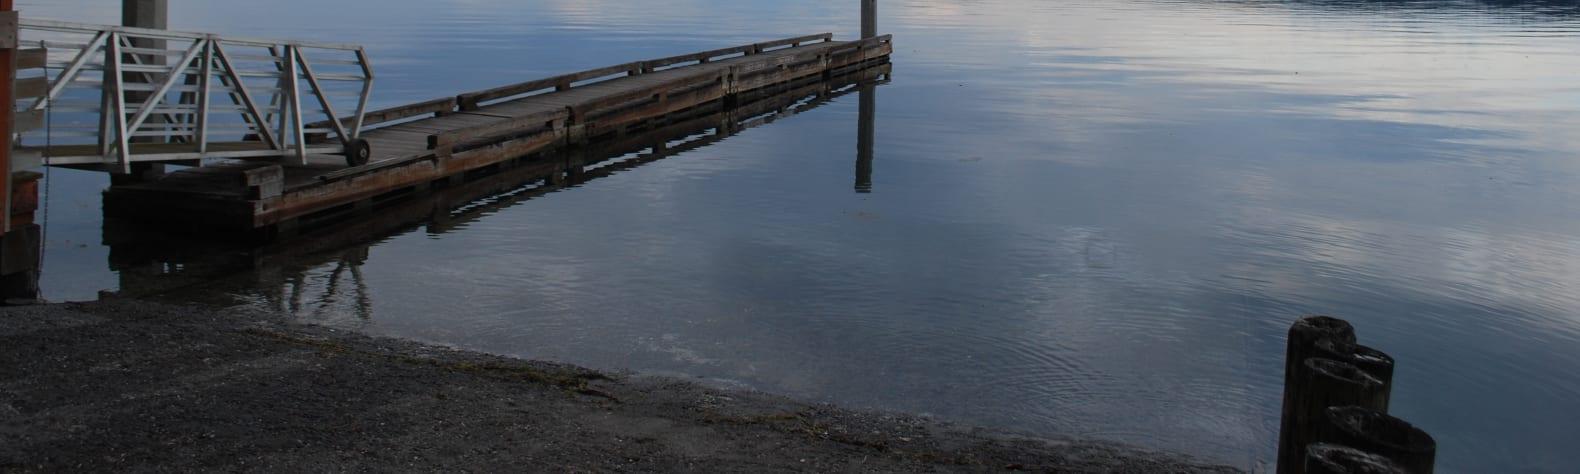 Sequim Bay State Park